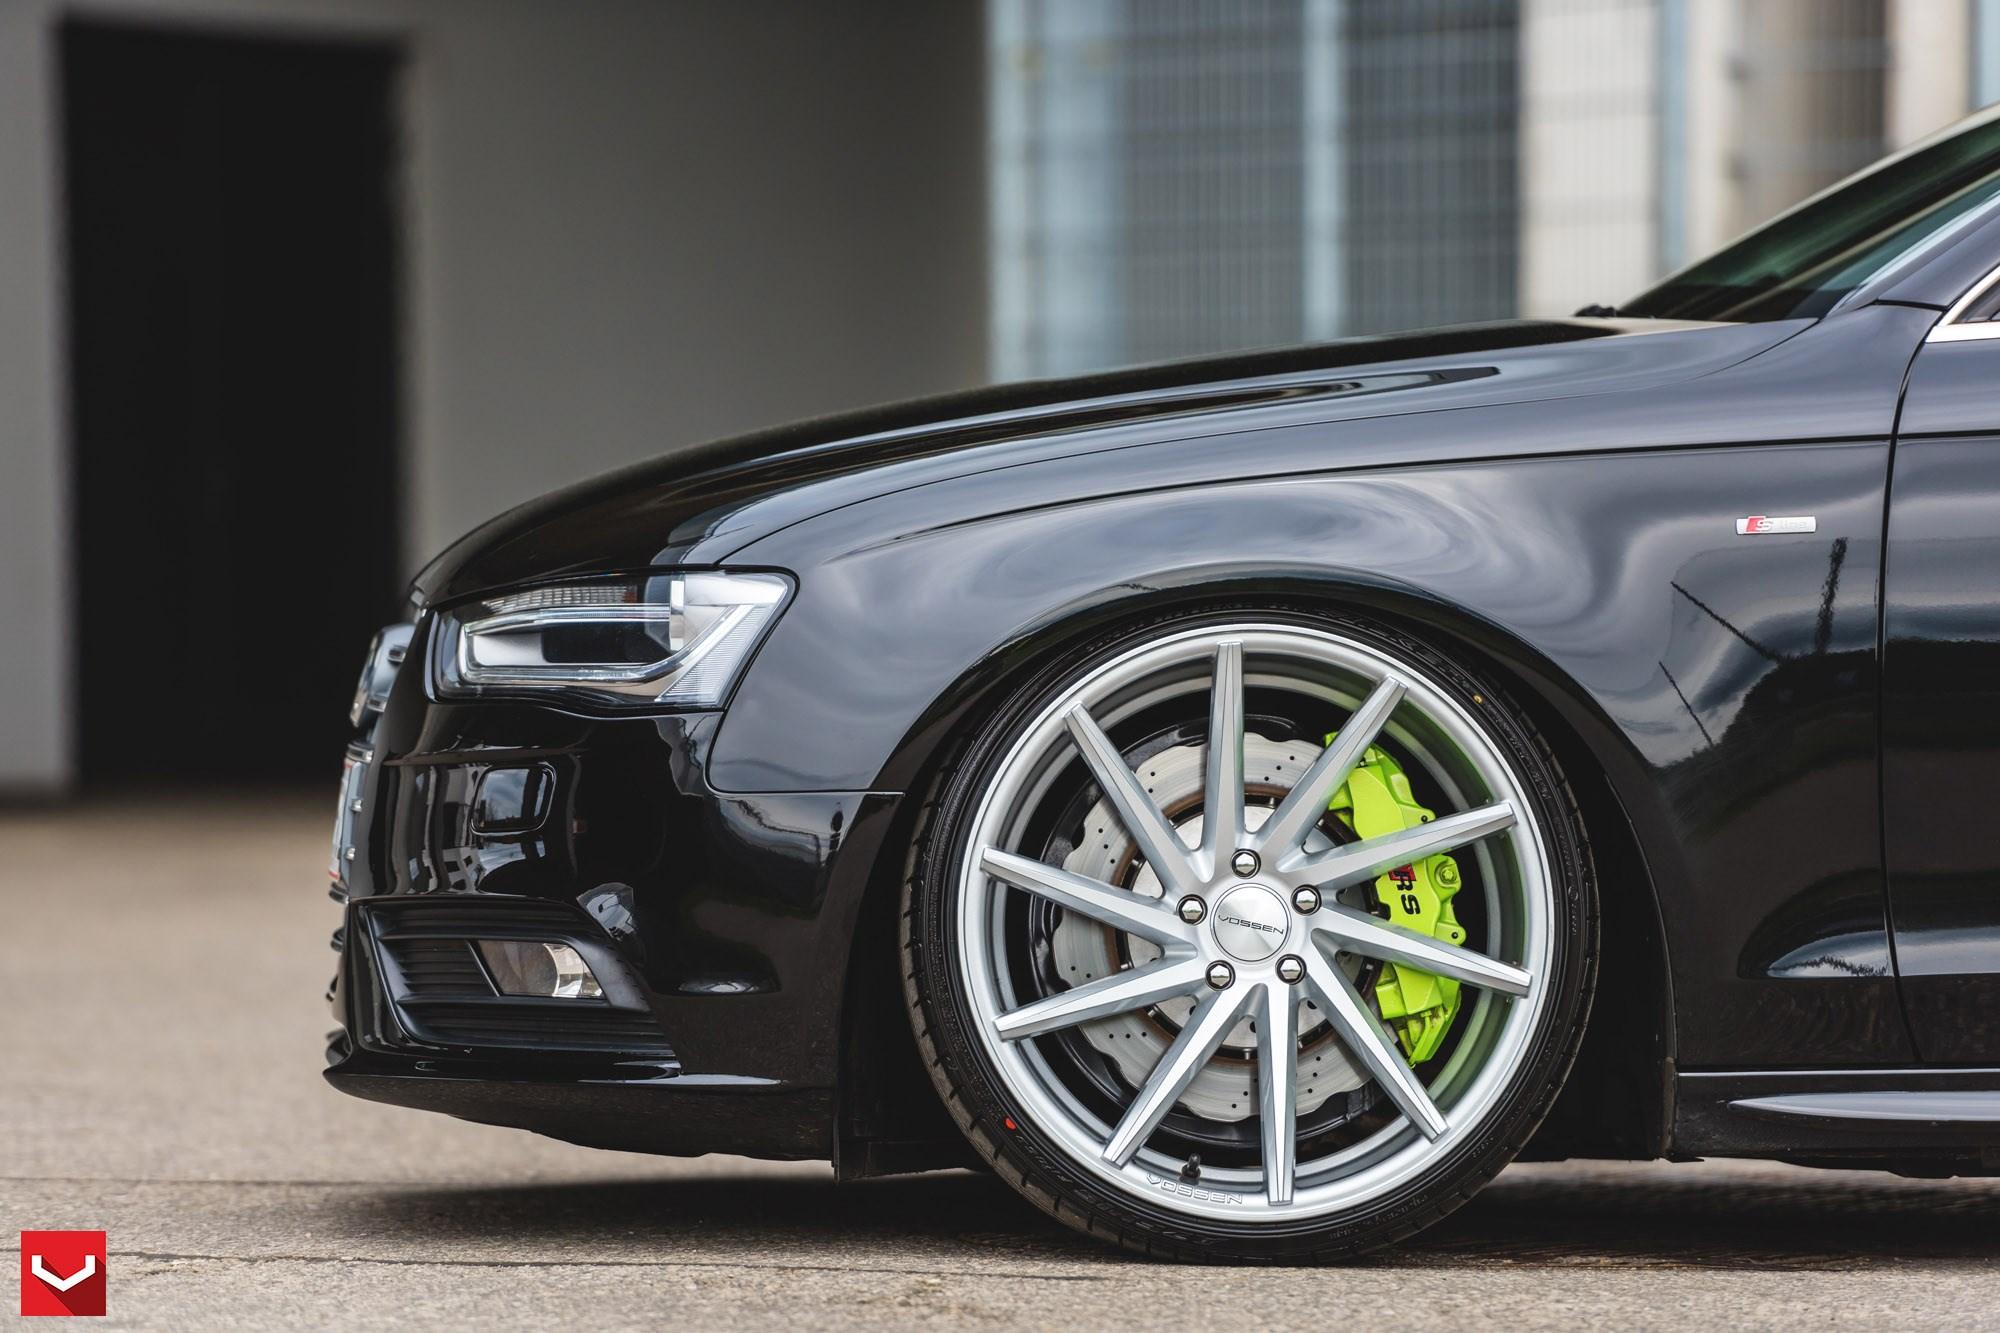 Vossen Cvt Auf Audi A4 Vossenwheels De Wheelscompany